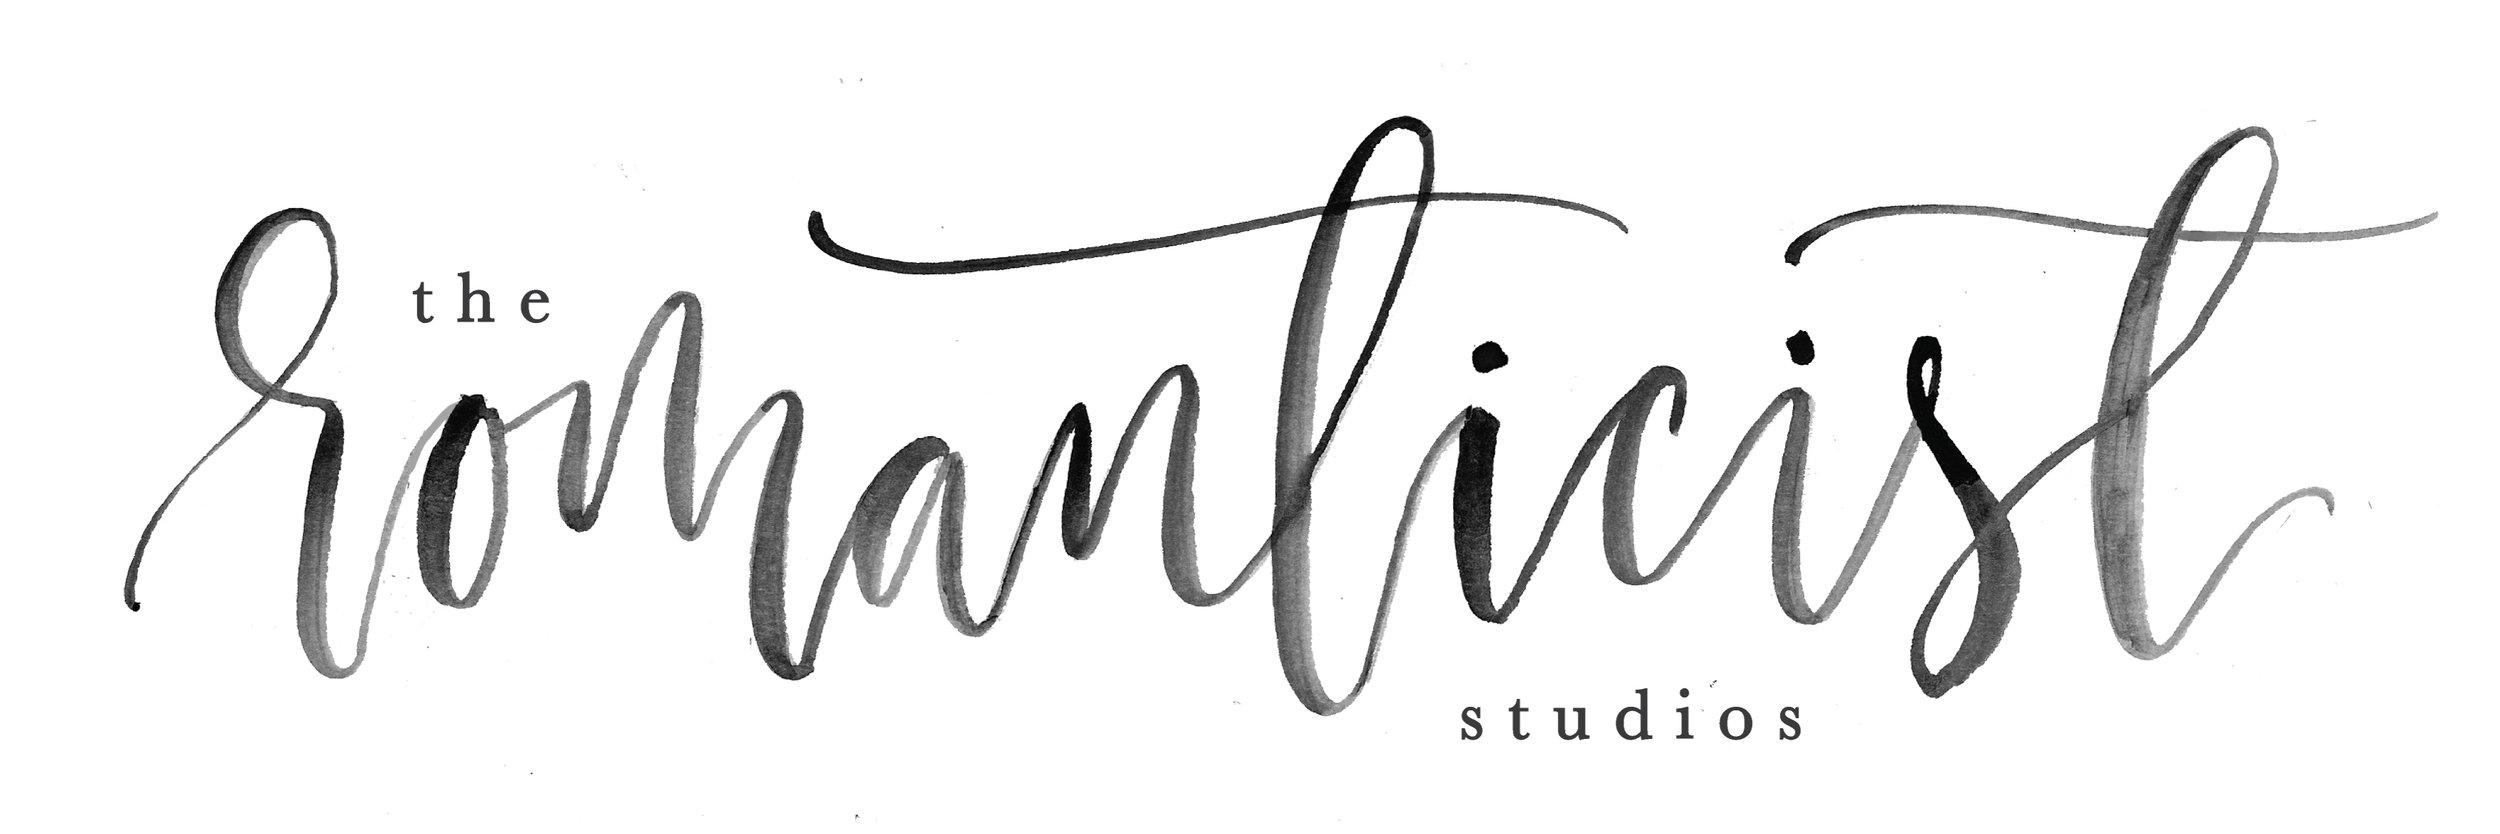 Romanticist-Logo-Watercolor.jpg